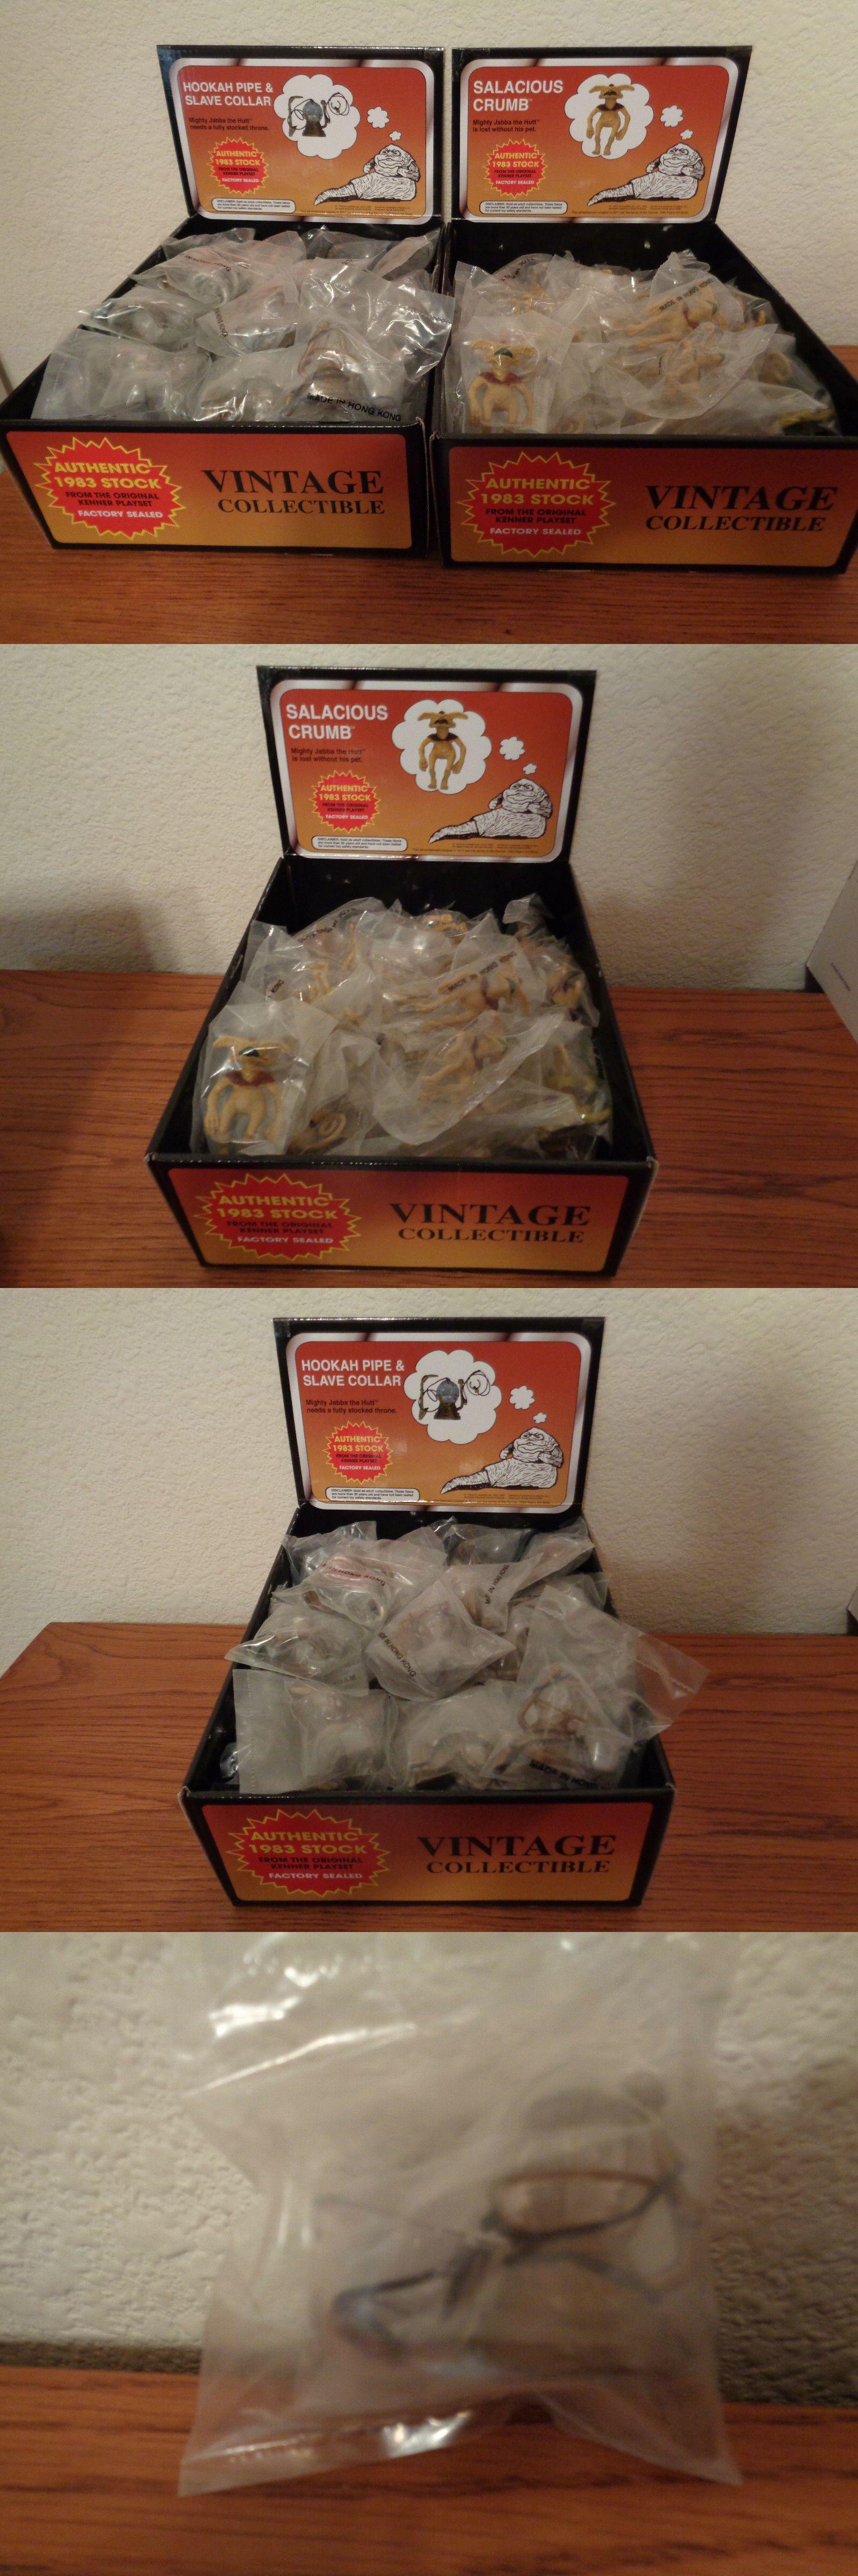 "Original Vintage 1983 Star Wars Jabba the Hutt 3.75/"" accessories Salacious Crumb"